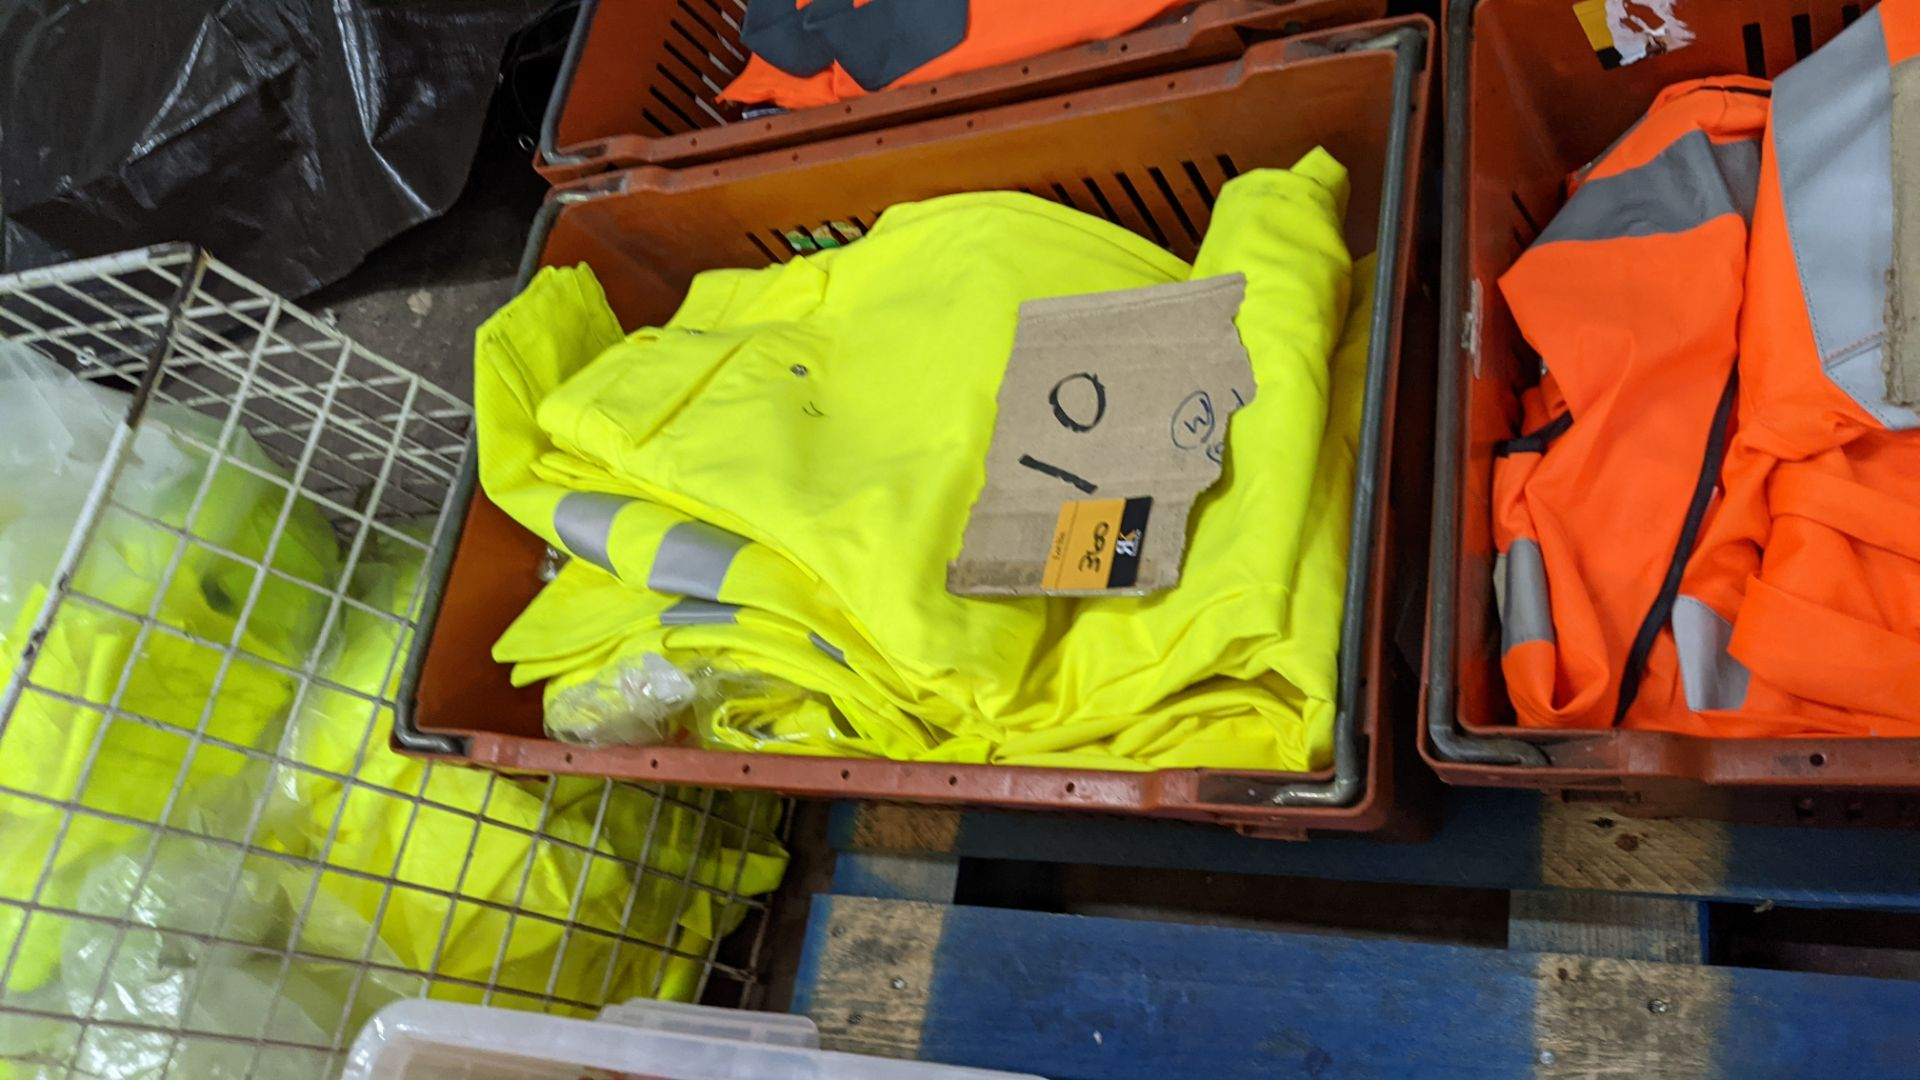 10 off hi-vis trousers in yellow & orange